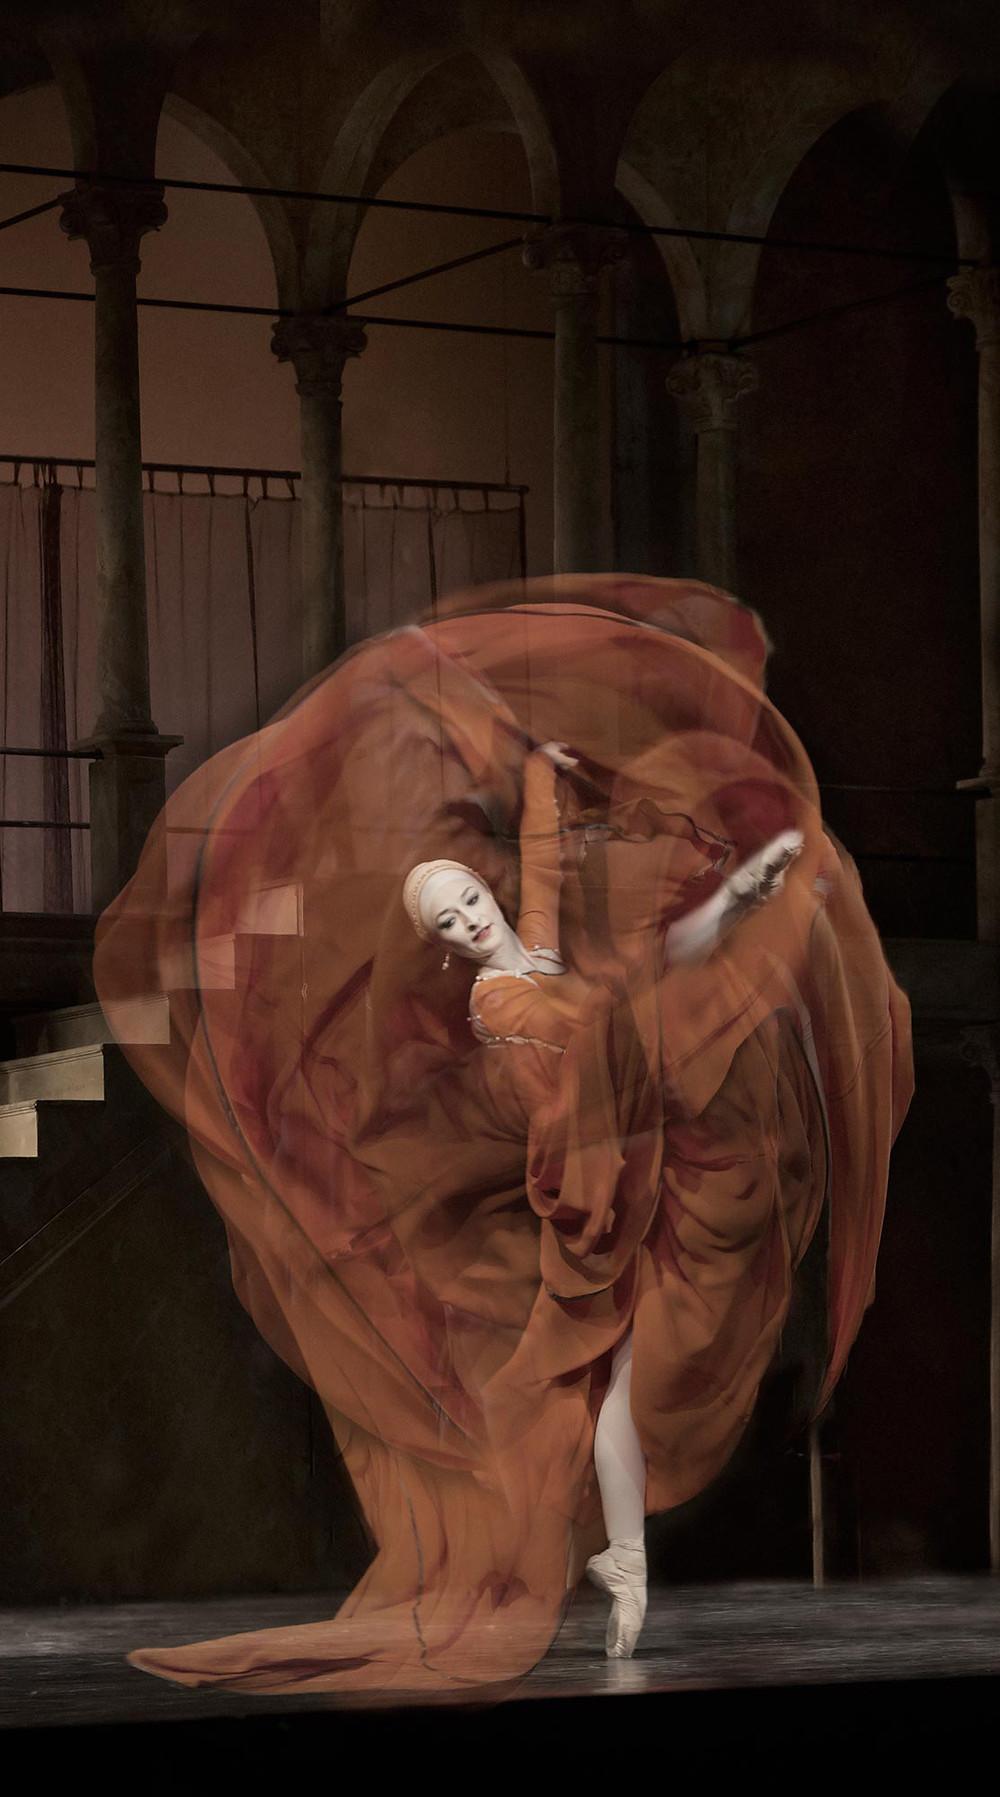 ingrid-bugge-ballet-photography-yellowtrace-04